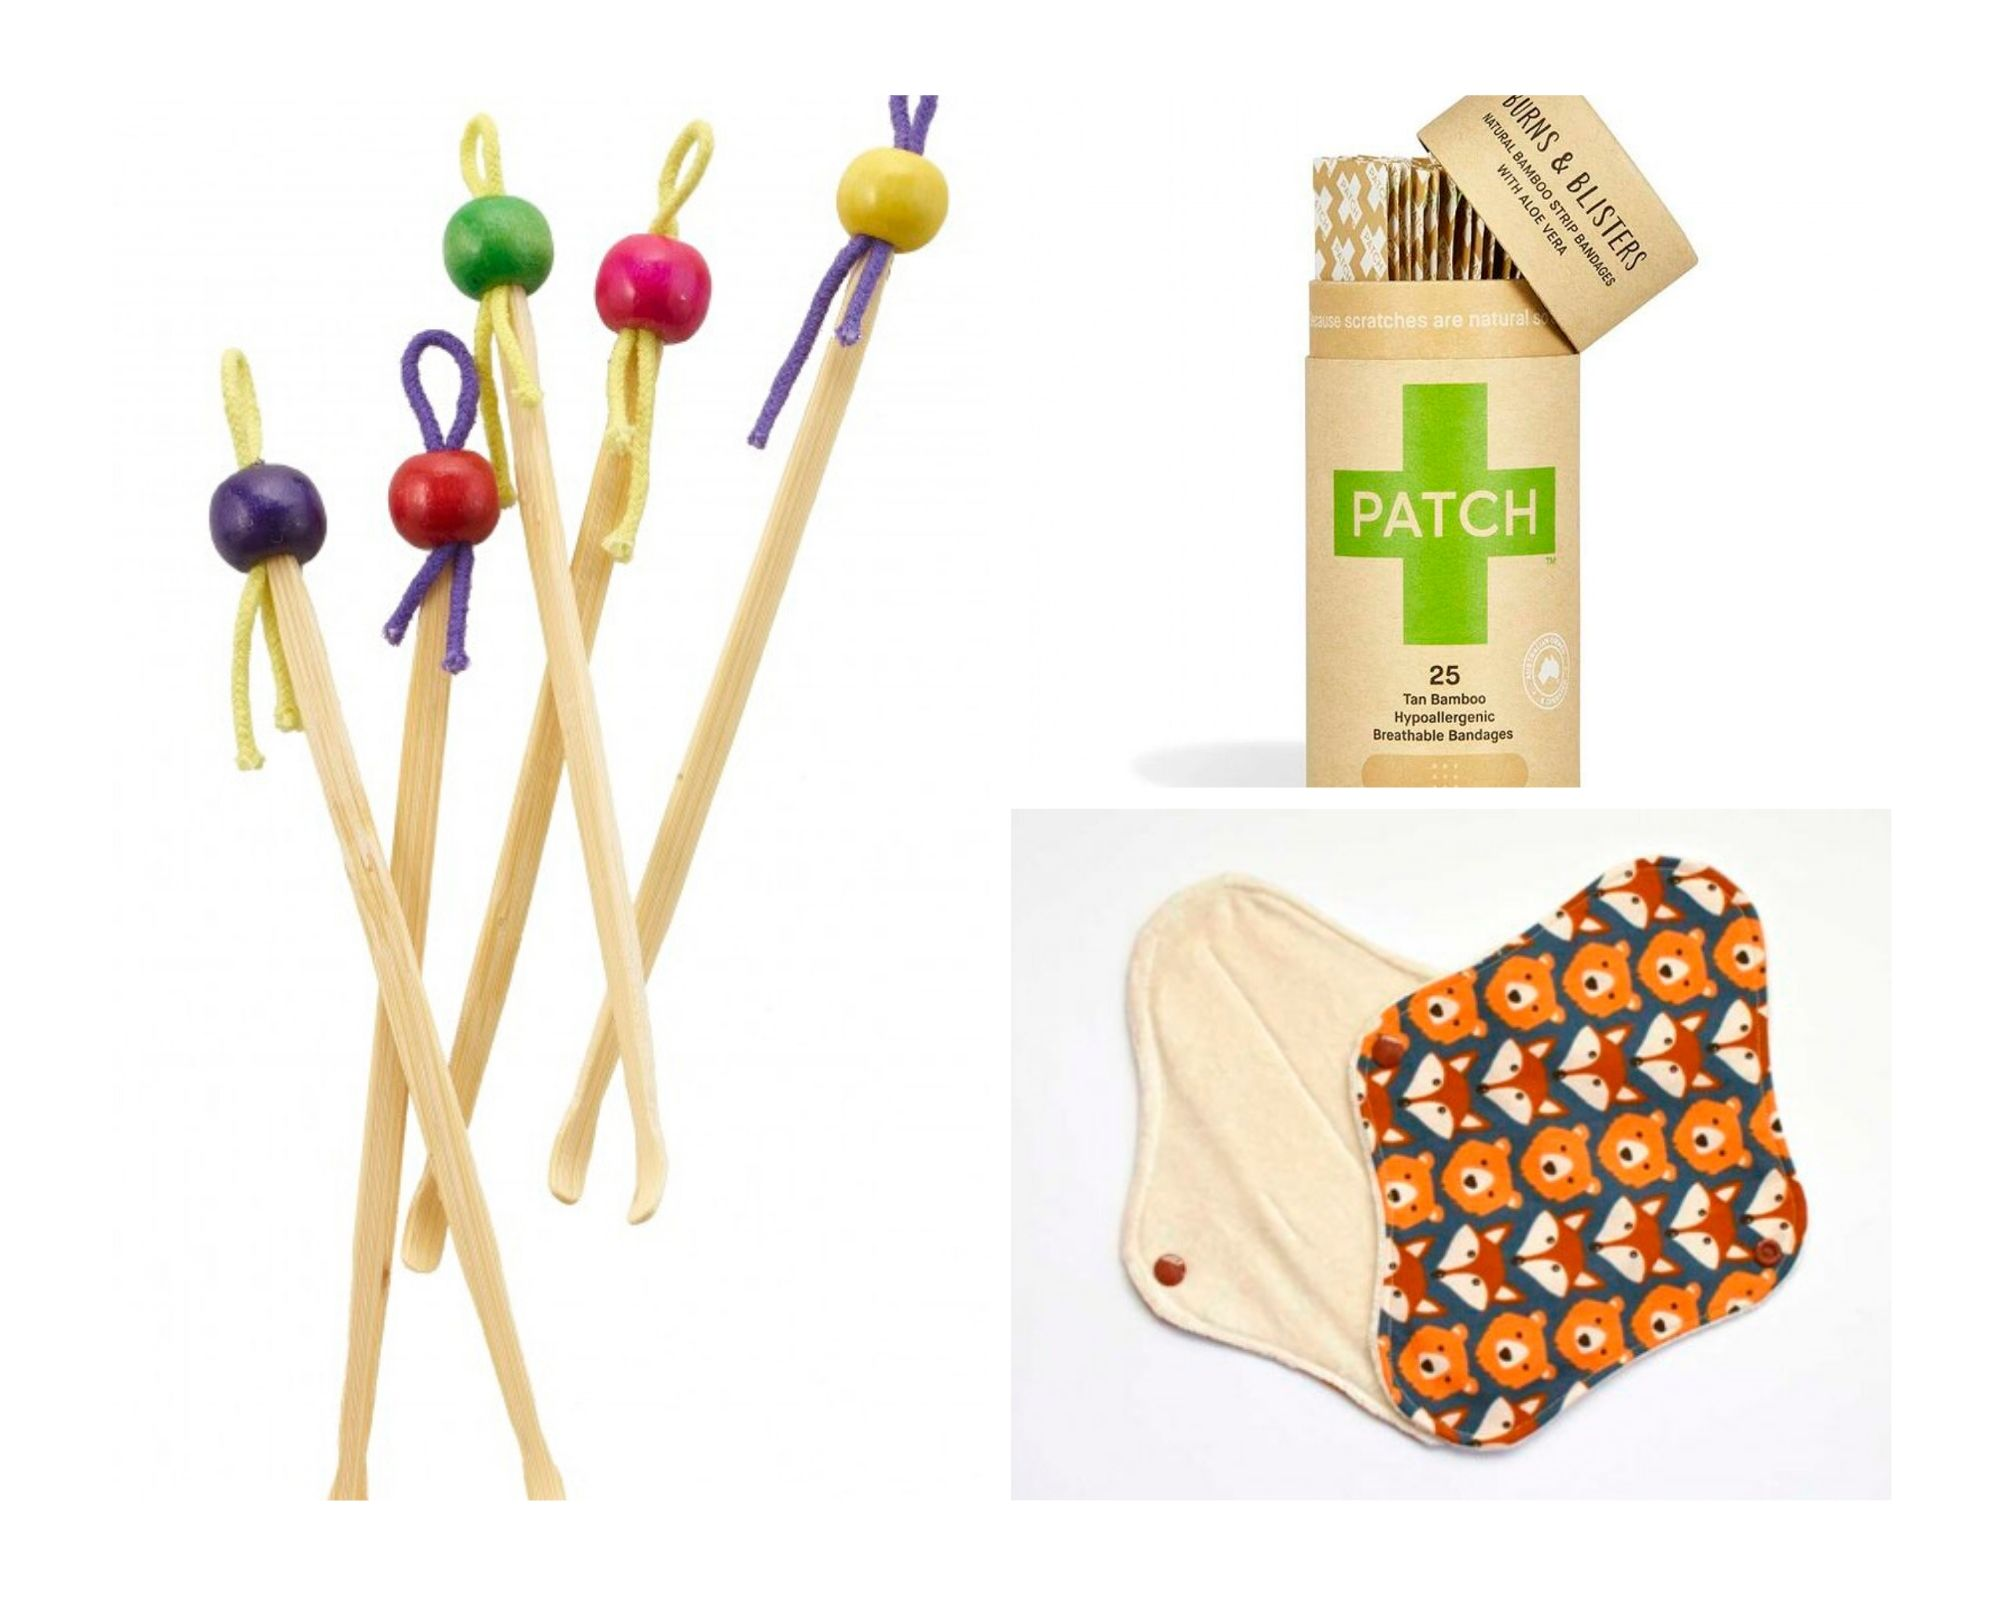 Bastonets, tiretes i compresa de bambú